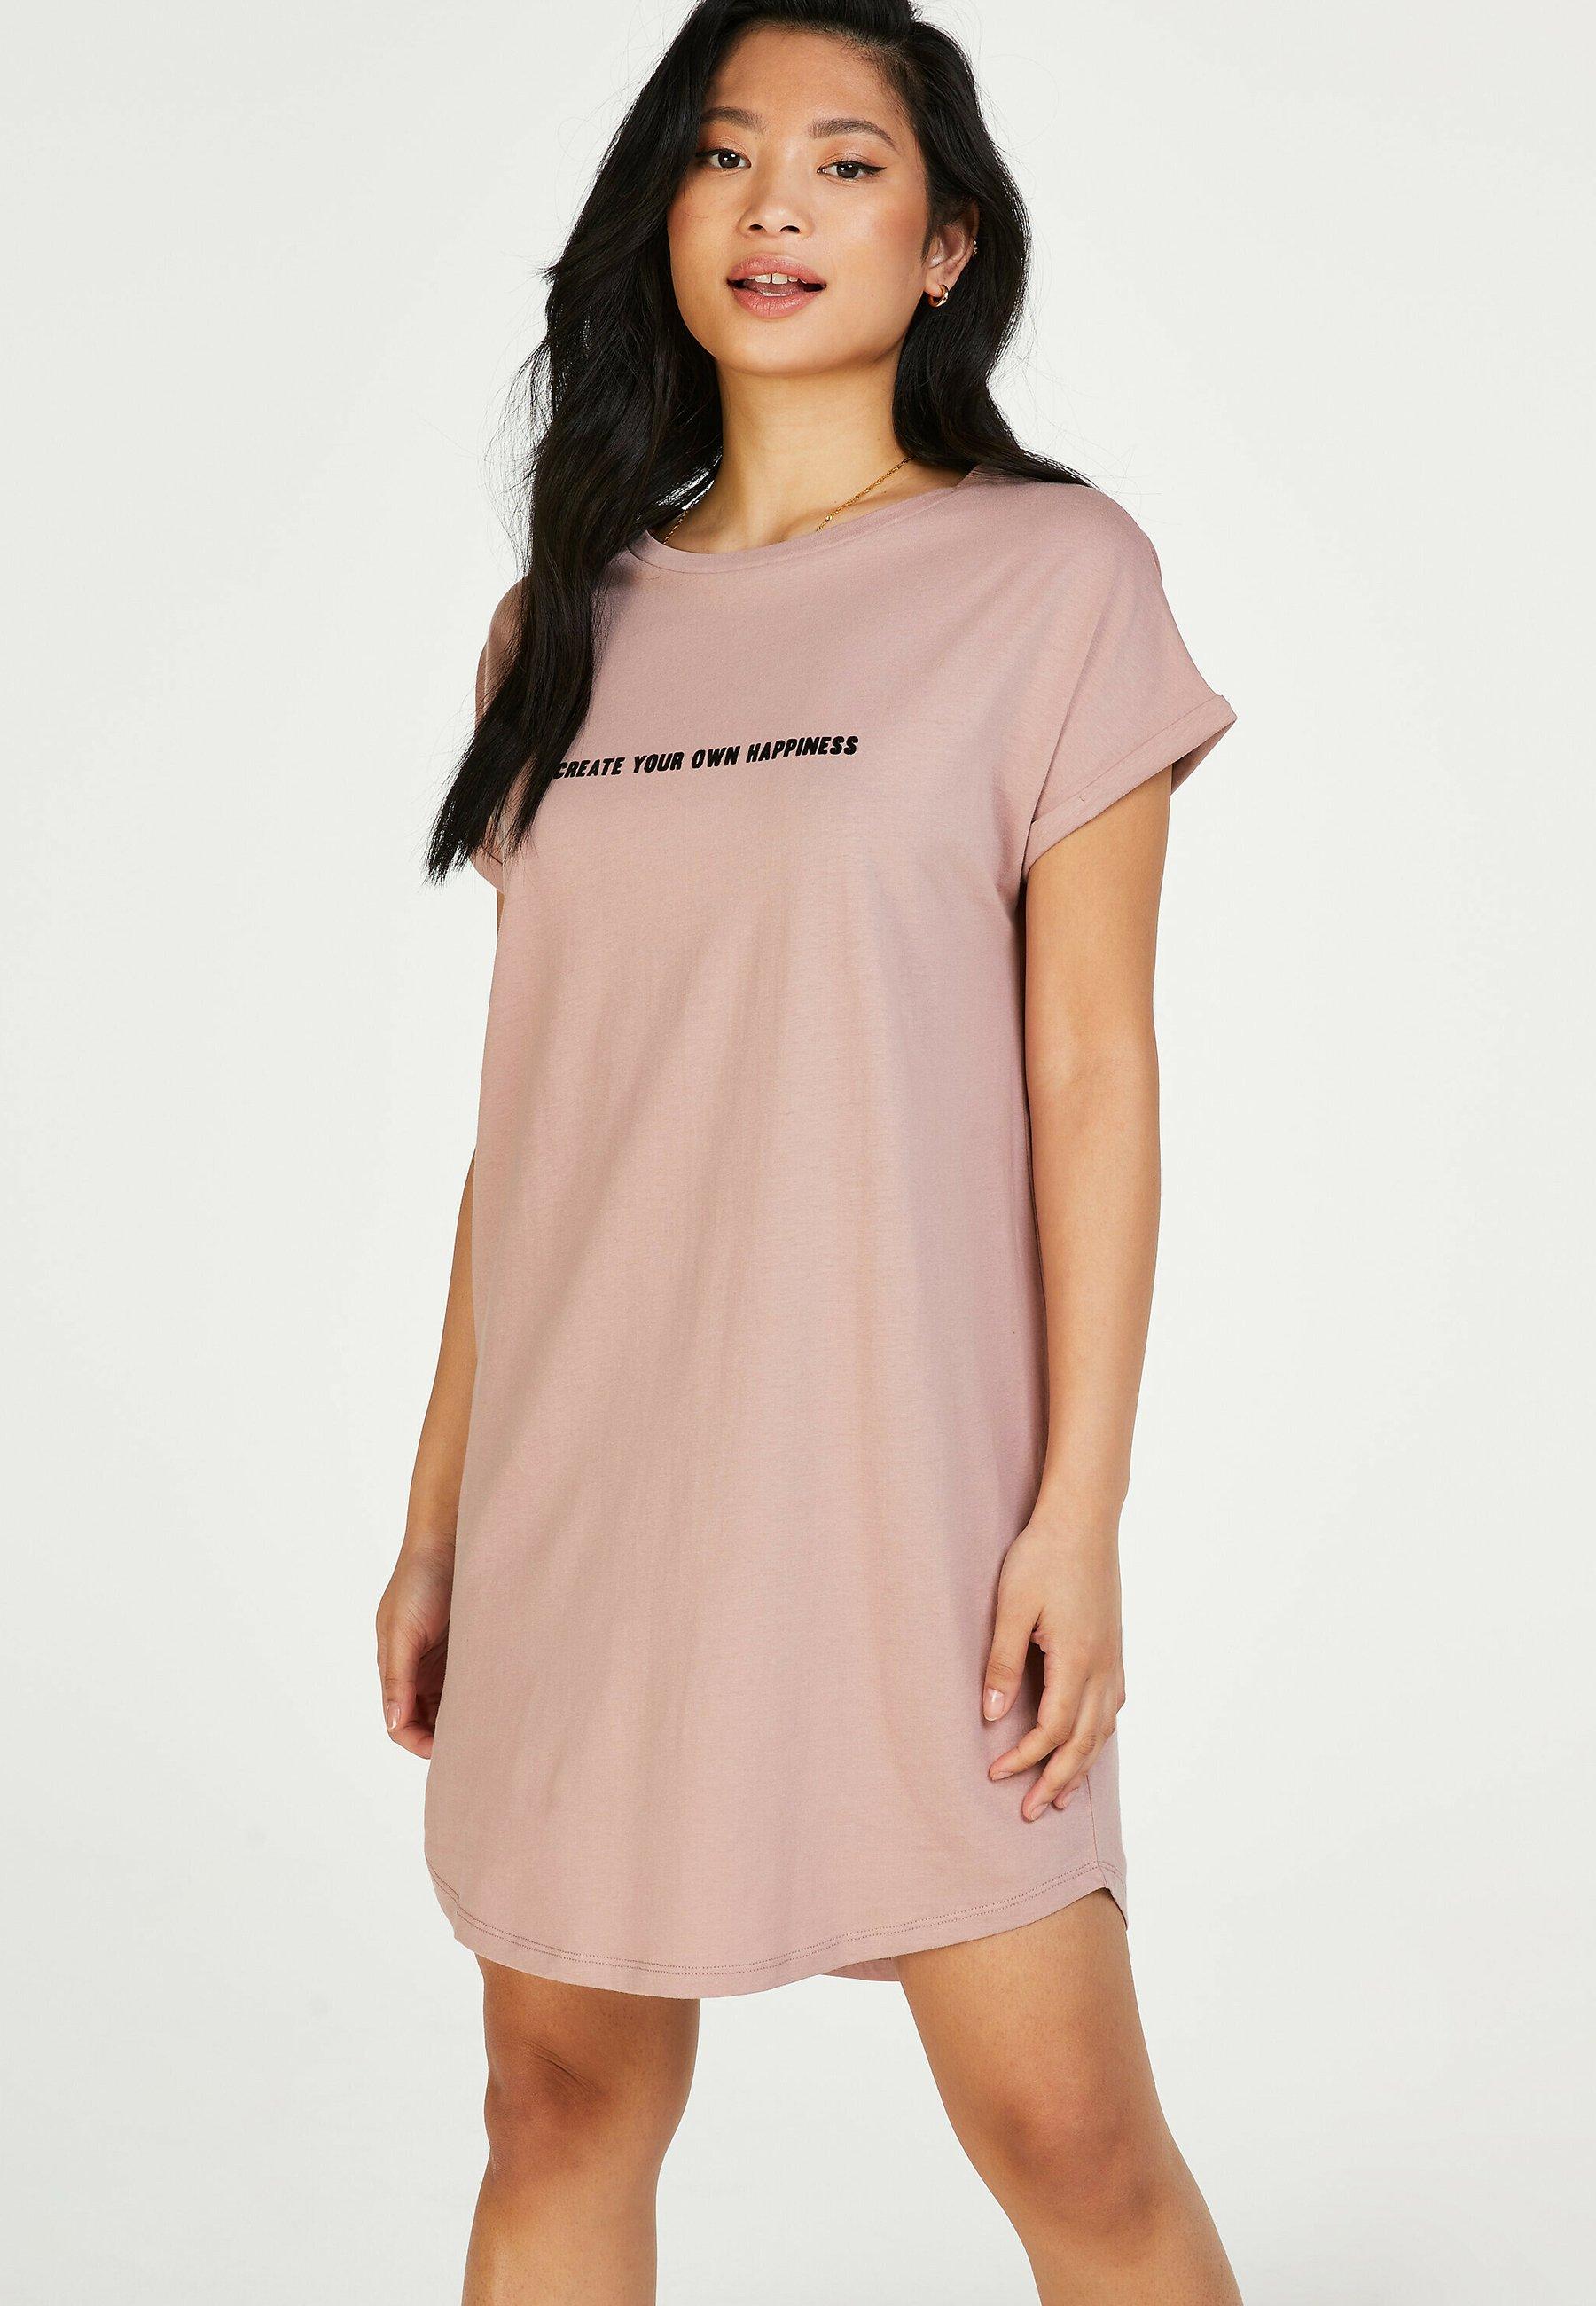 Damen RUNDHALSAUSSCHNITT - Nachthemd